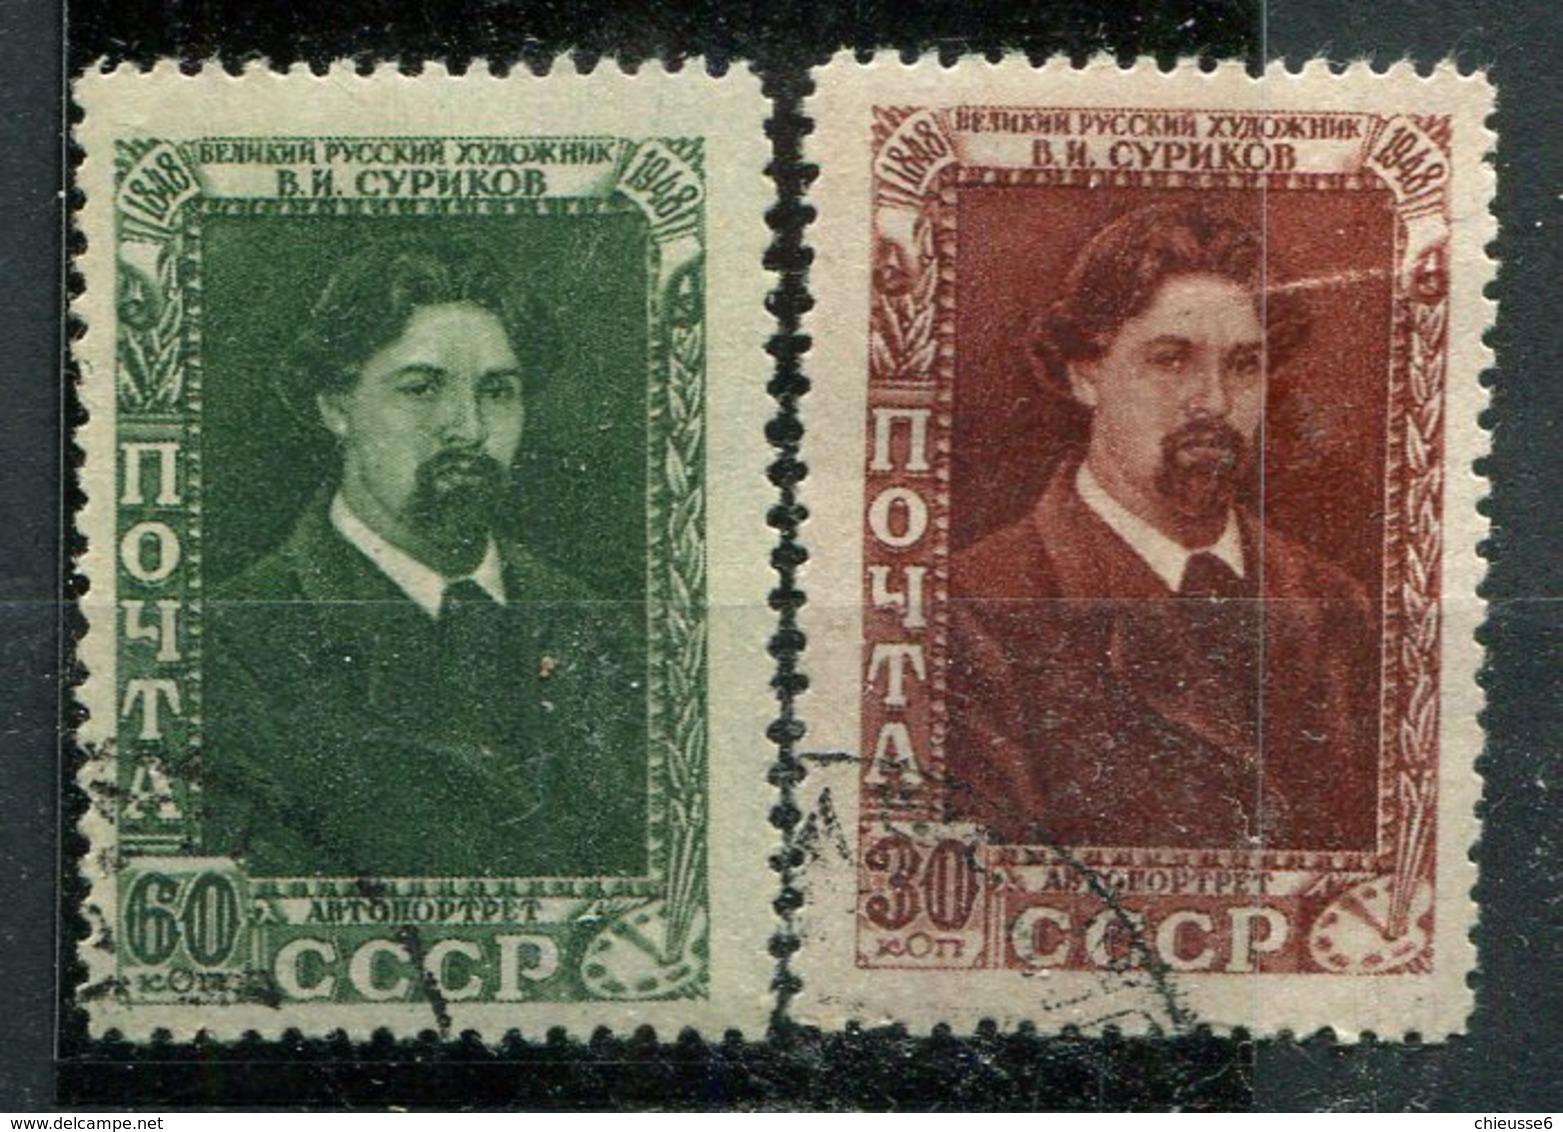 Russie Ob N° 1188 /1189 - Peintre Vassili I. Sourikov - Used Stamps